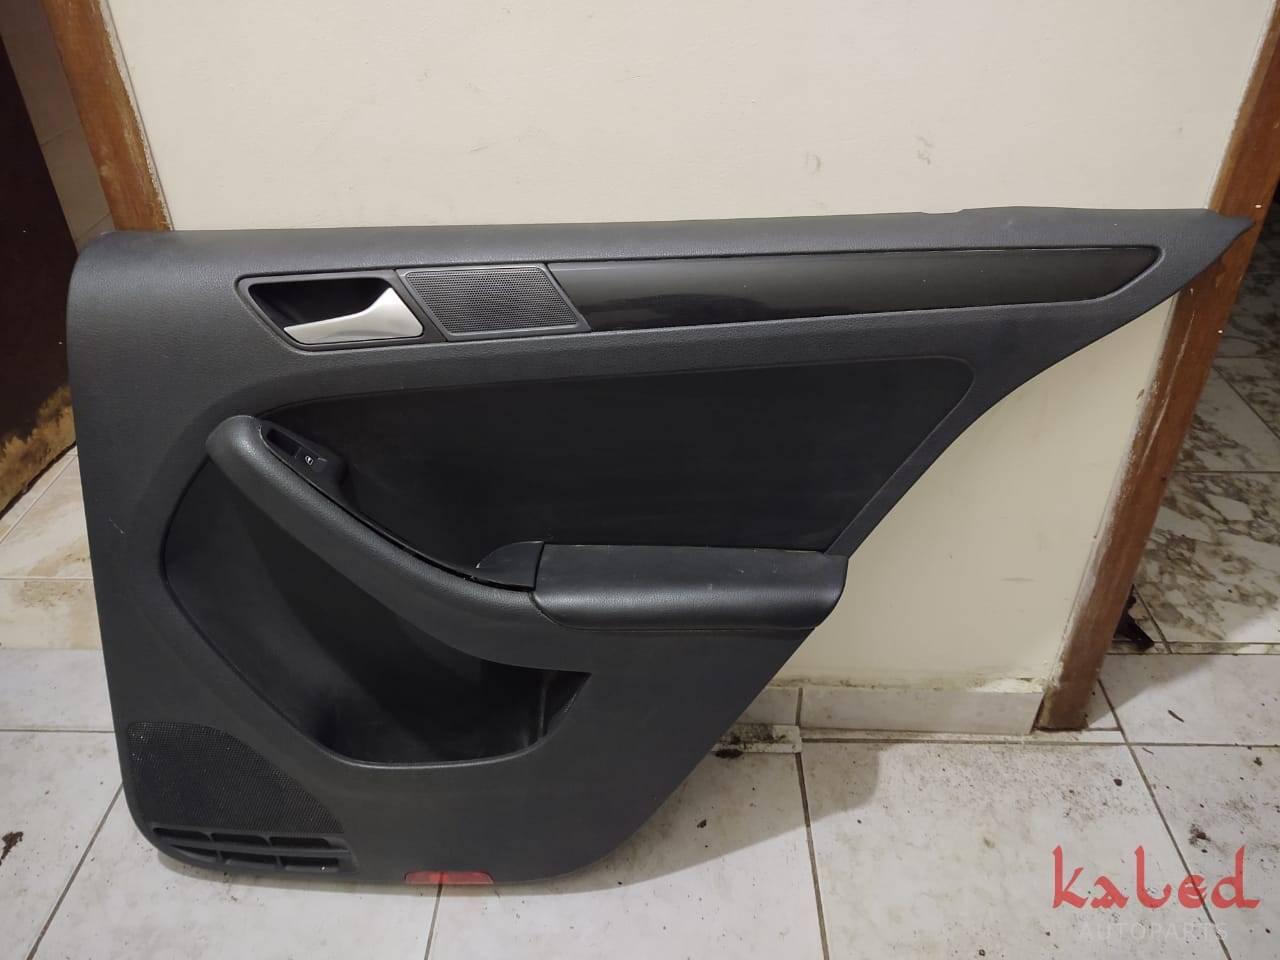 Forro porta traseiro direito VW Jetta 2.0 tsi comfortline  - Kaled Auto Parts